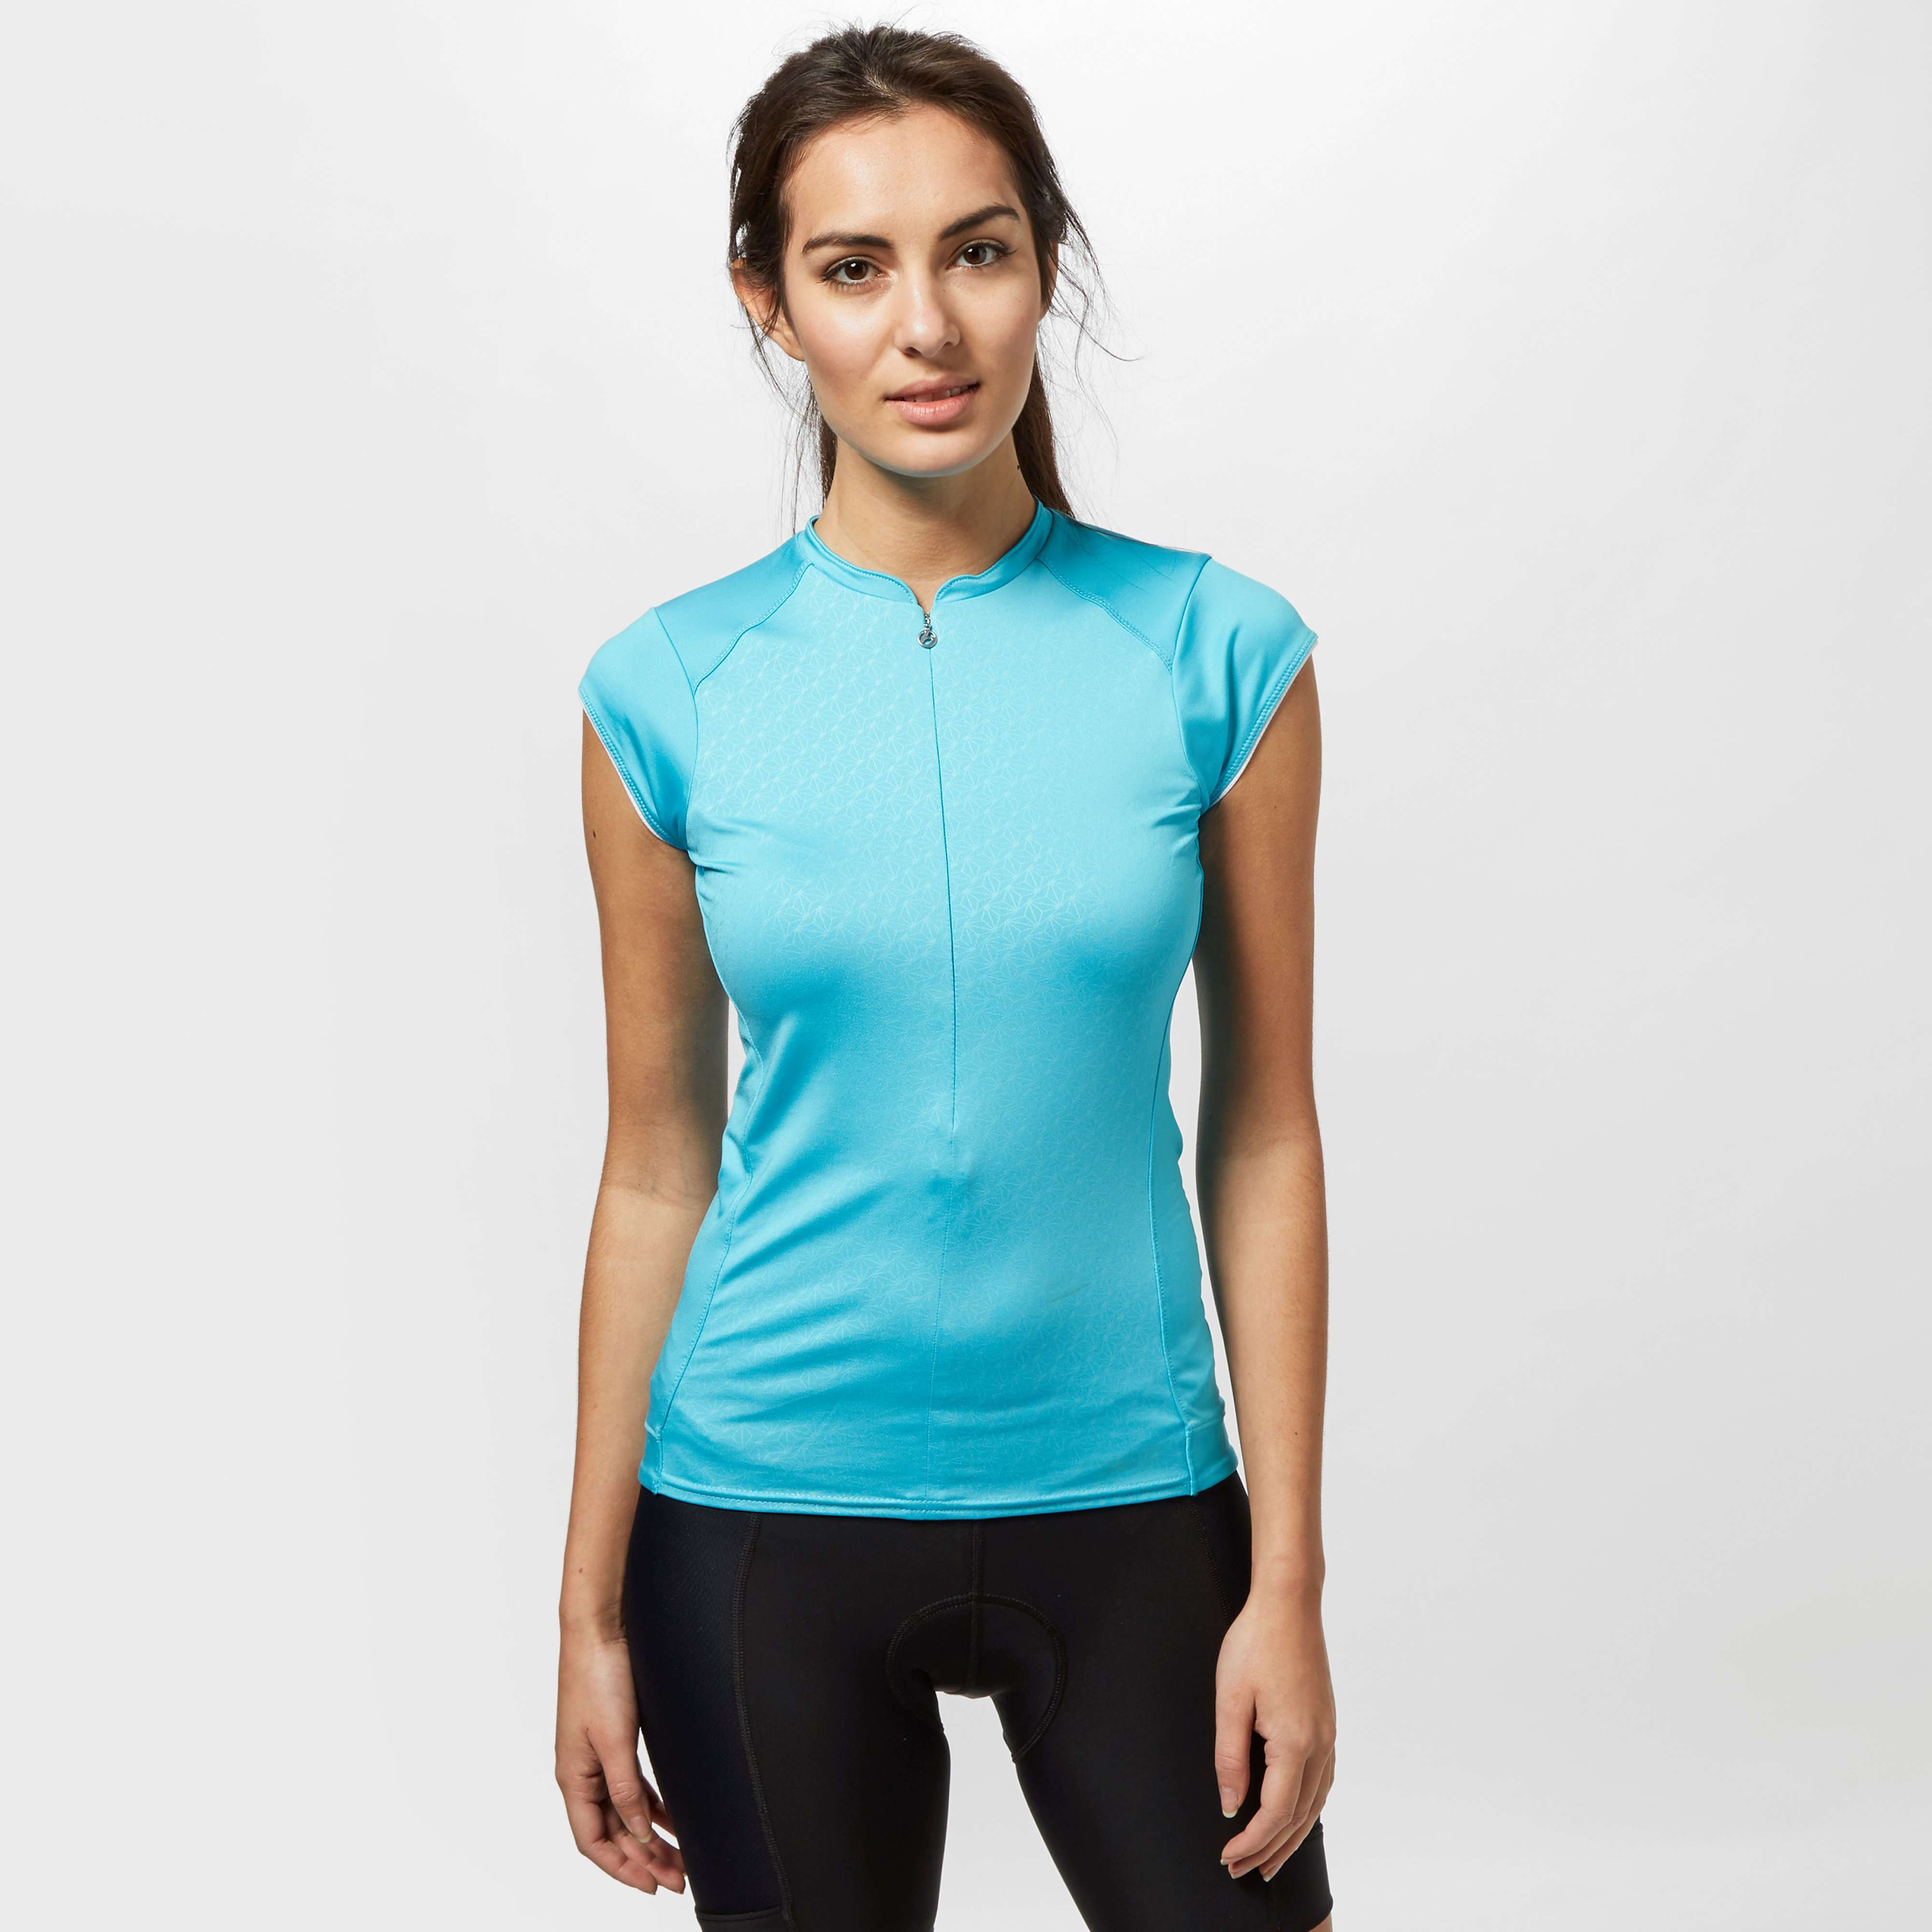 BONTRAGER Women's Vella Cycling Jersey